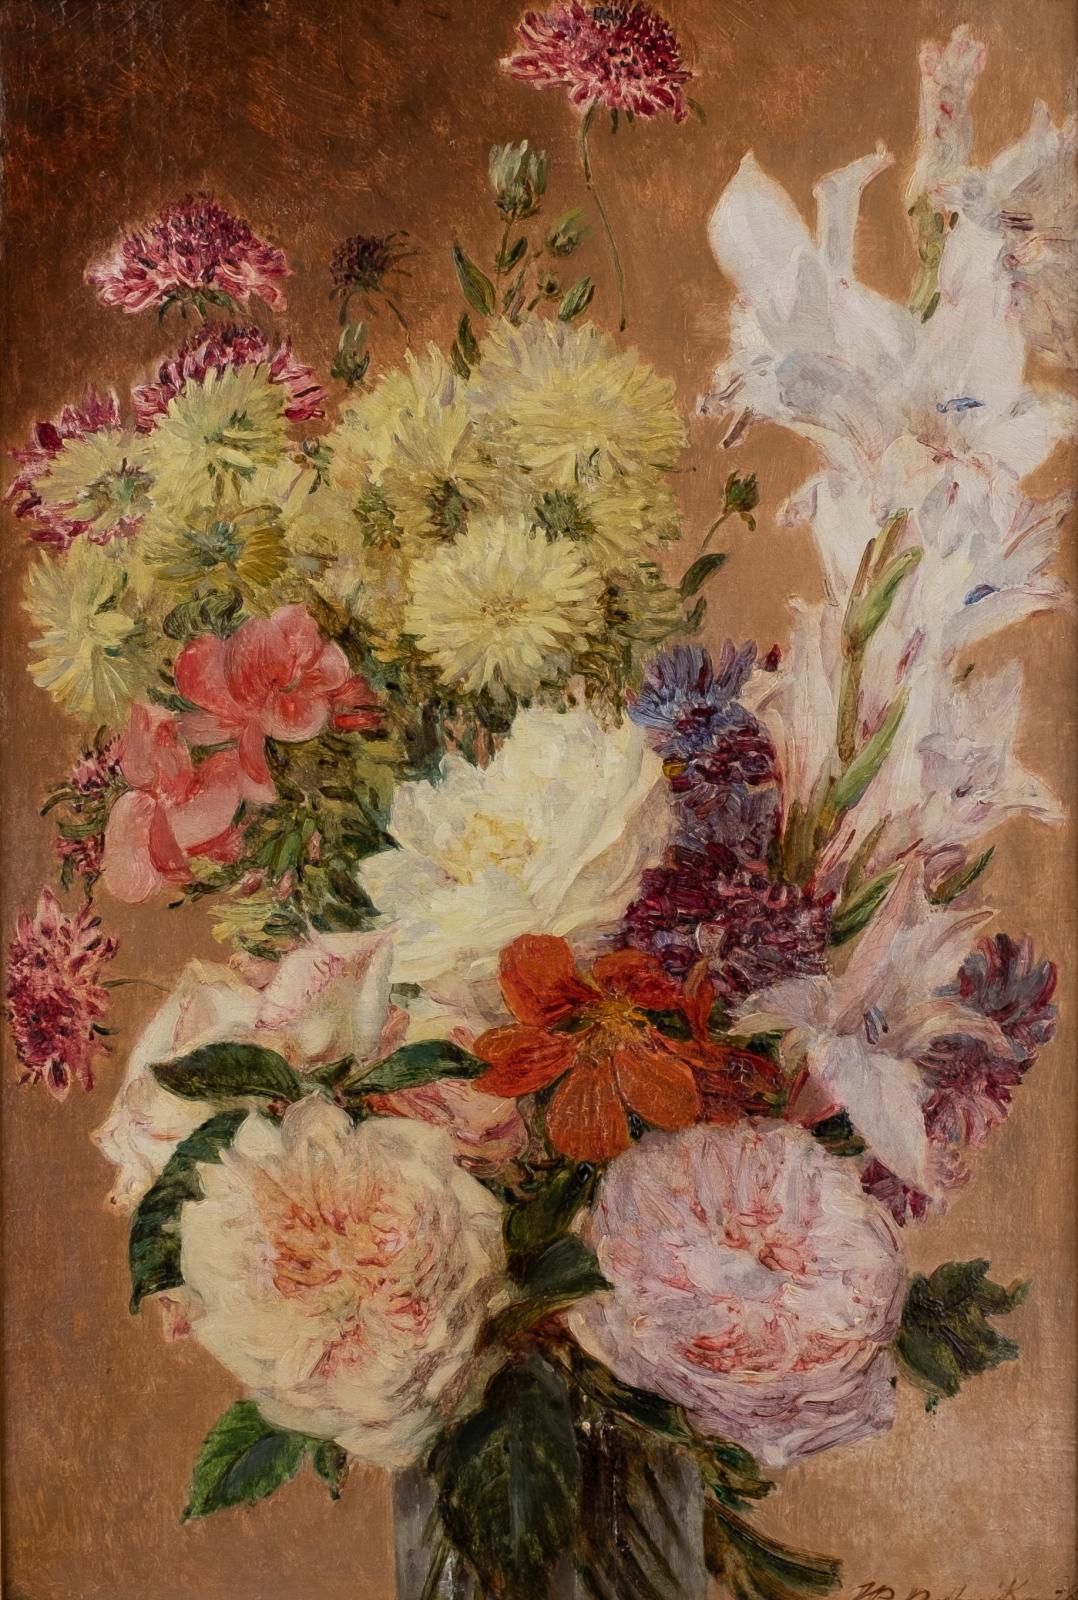 A still life of flowers